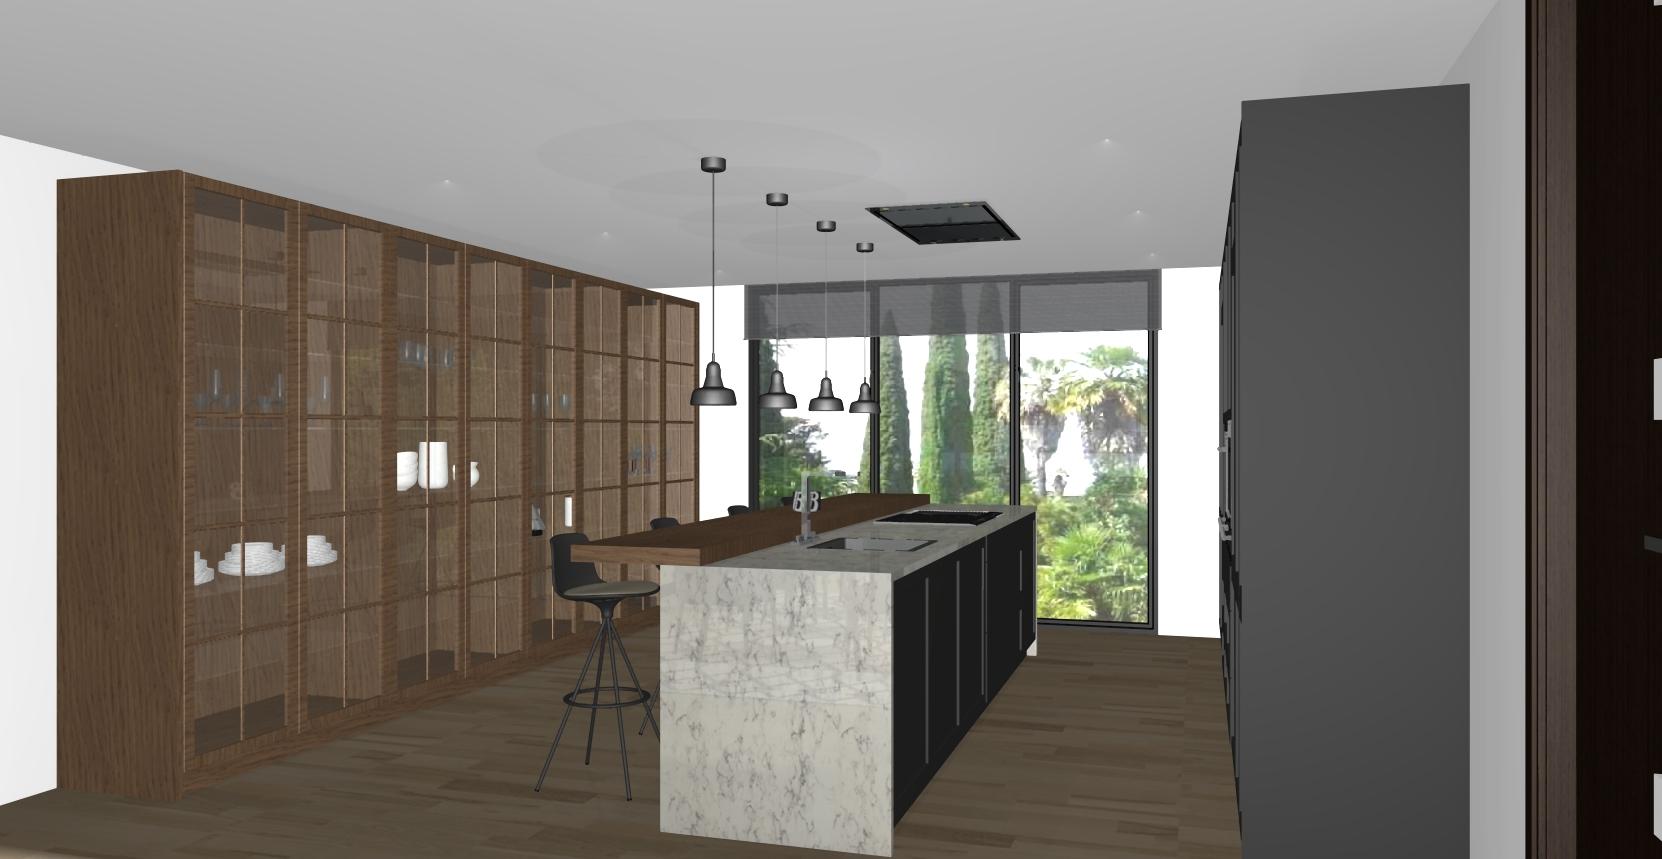 Binteriorismo mobiliario cocina muebles lugo galicia - Viviendas modulares galicia ...